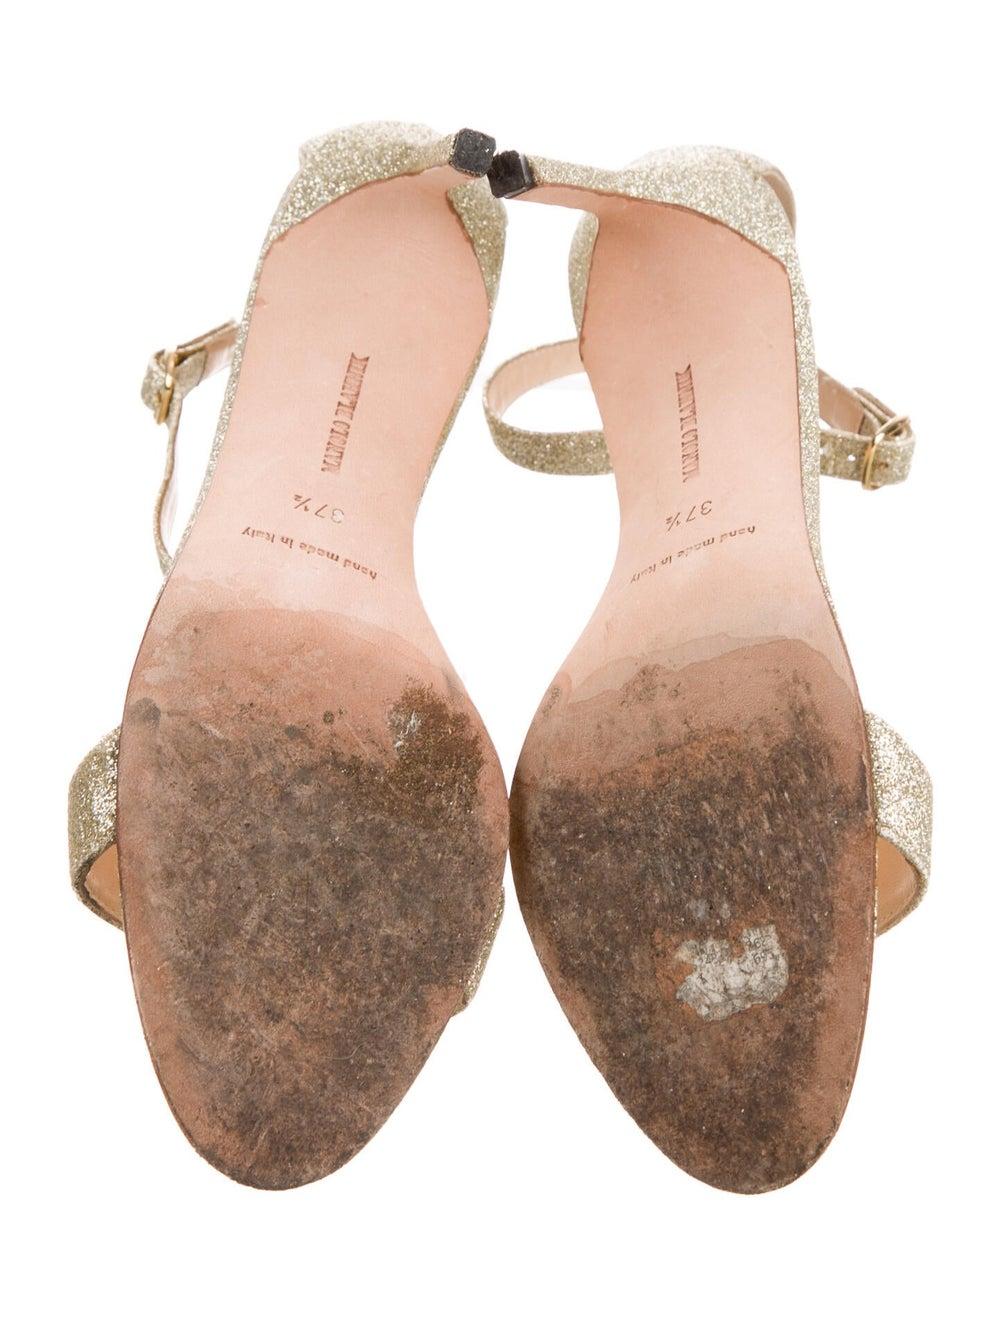 Manolo Blahnik Sandals Gold - image 5